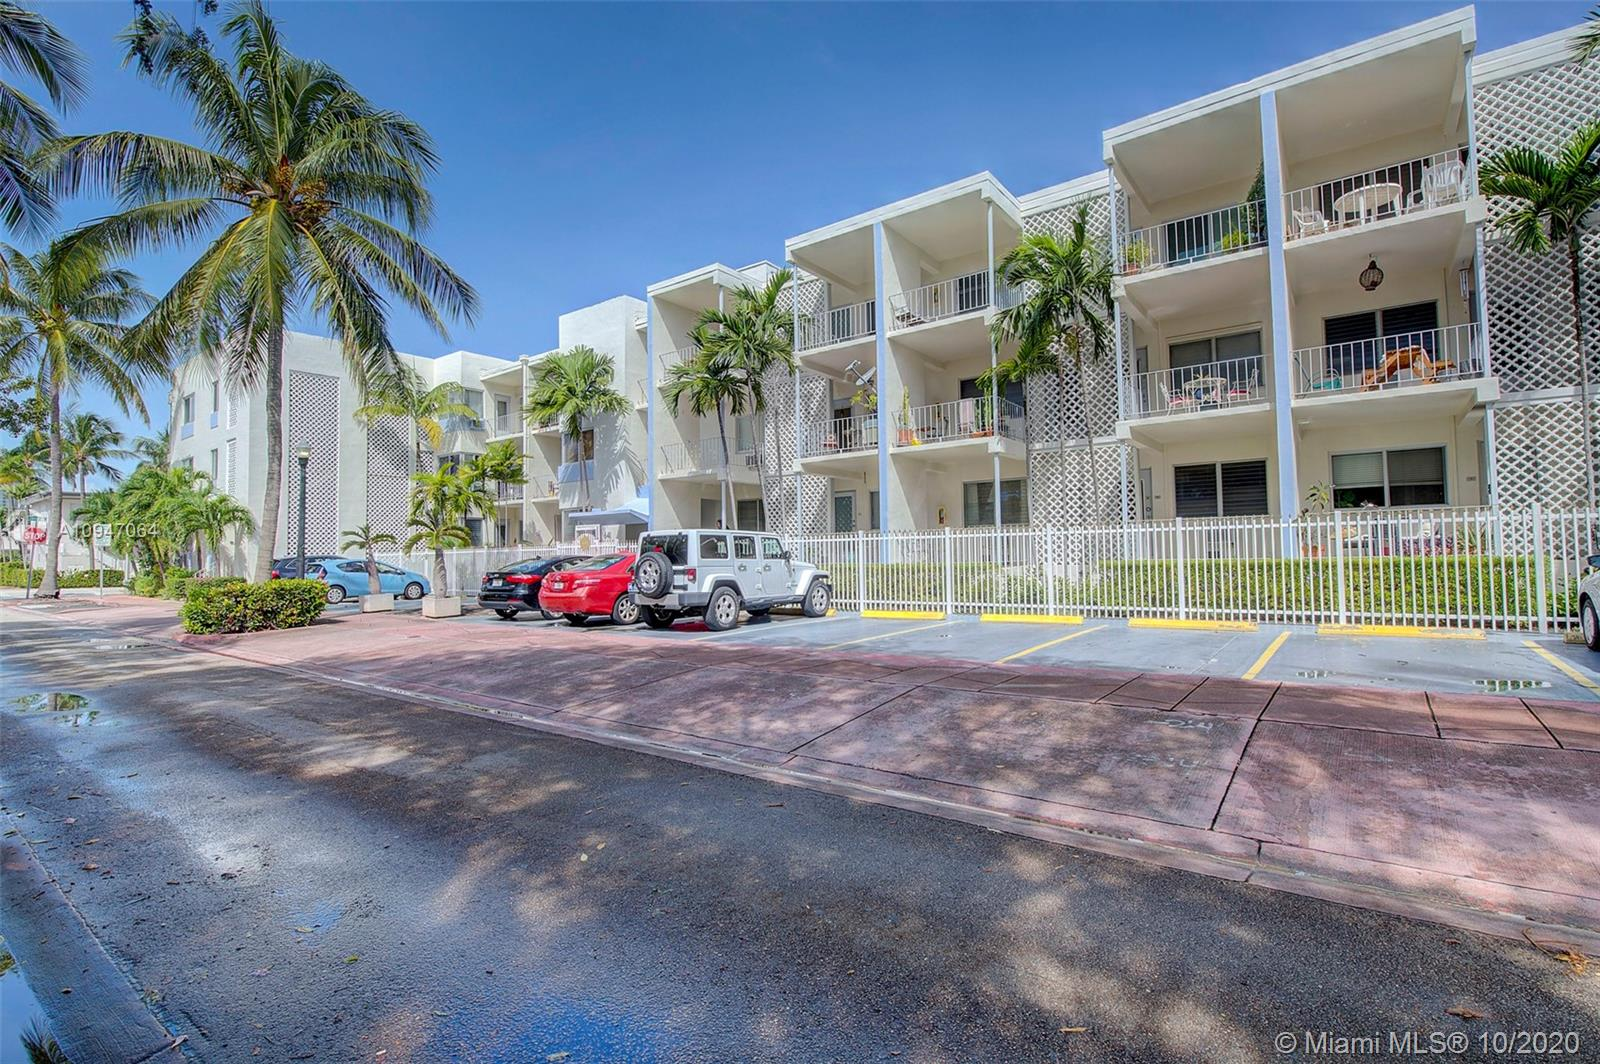 641 Espanola Way # 24, Miami Beach, Florida 33139, ,1 BathroomBathrooms,Residential,For Sale,641 Espanola Way # 24,A10947064